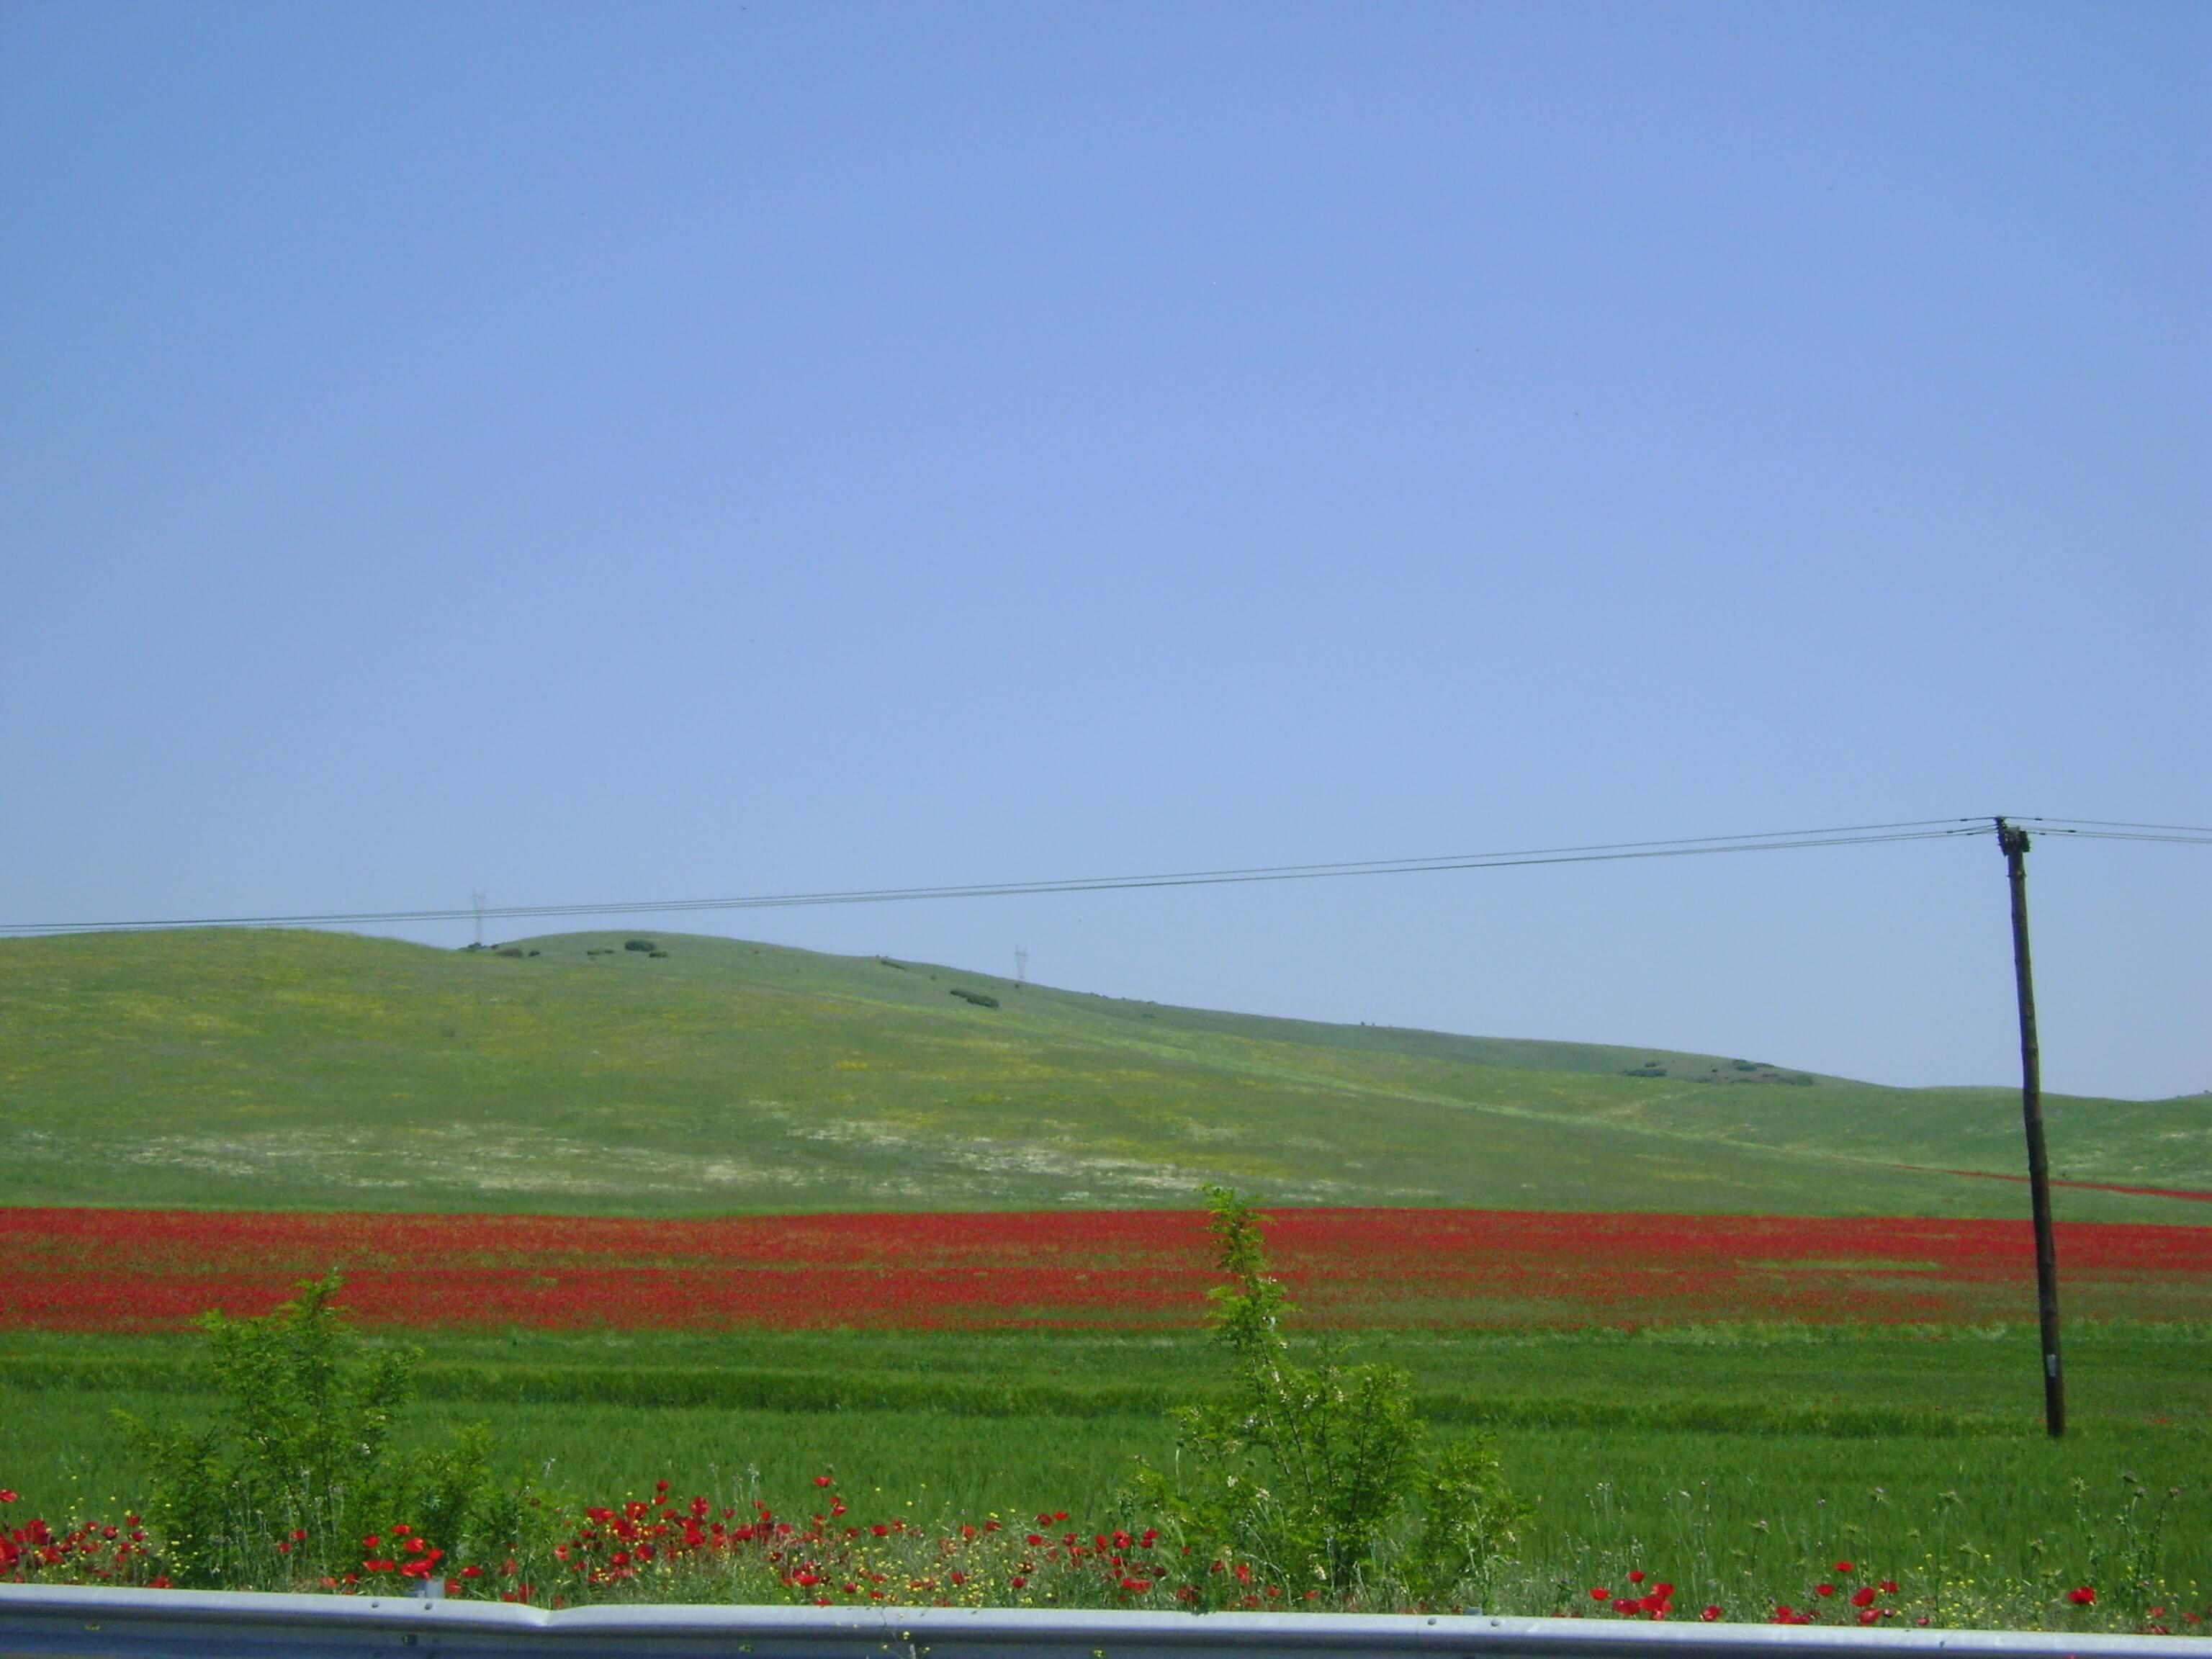 thessaly ksd photo